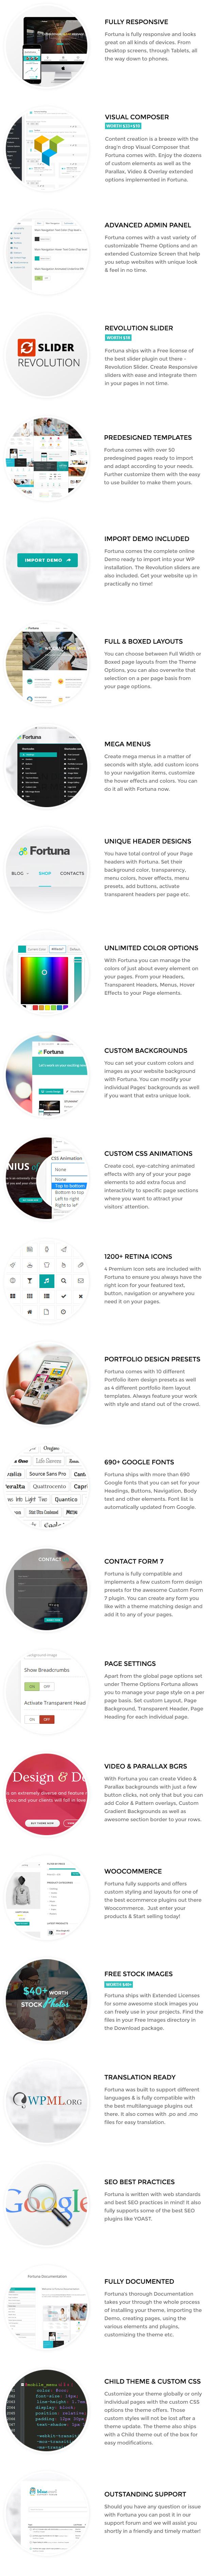 Fortuna - Responsive Multi-Purpose WordPress Theme - 15